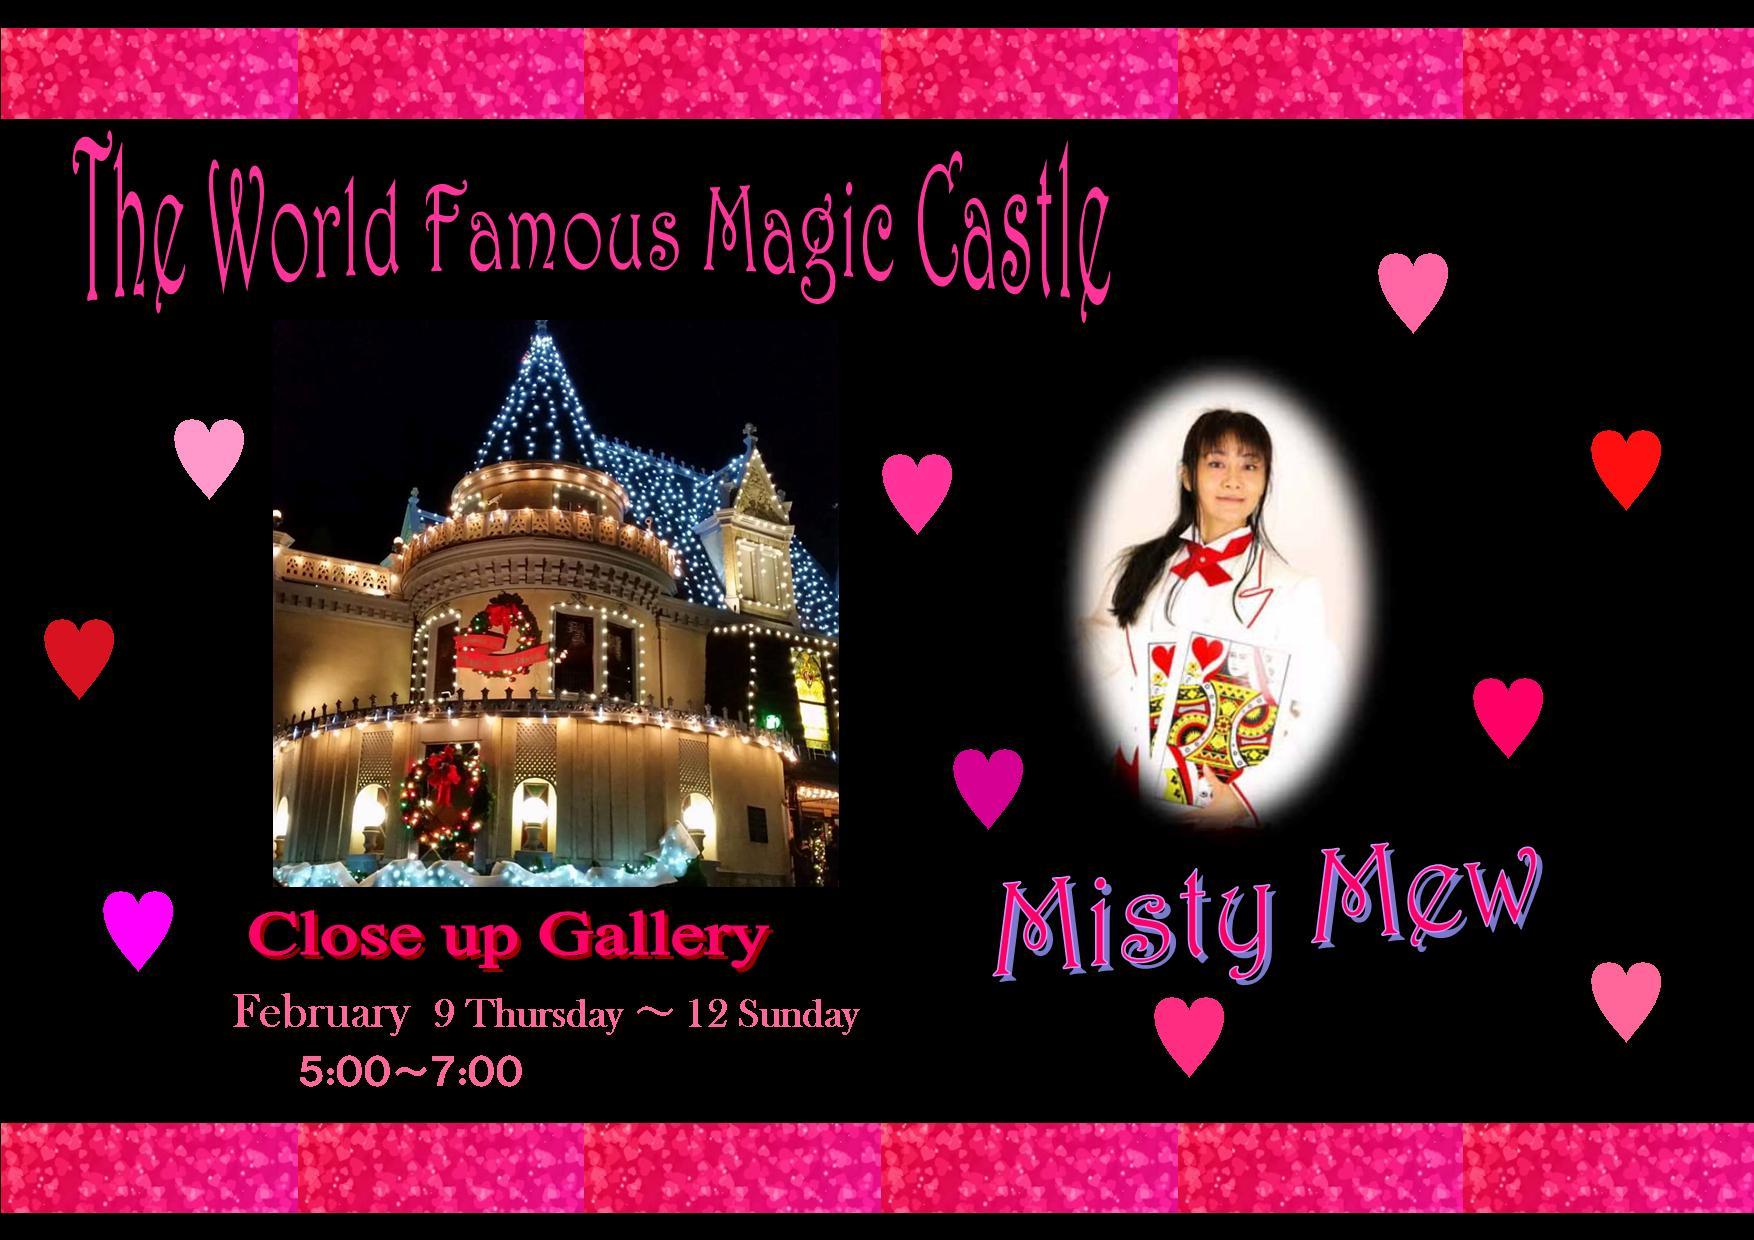 castlemisty02_20170124163326f2c.jpg